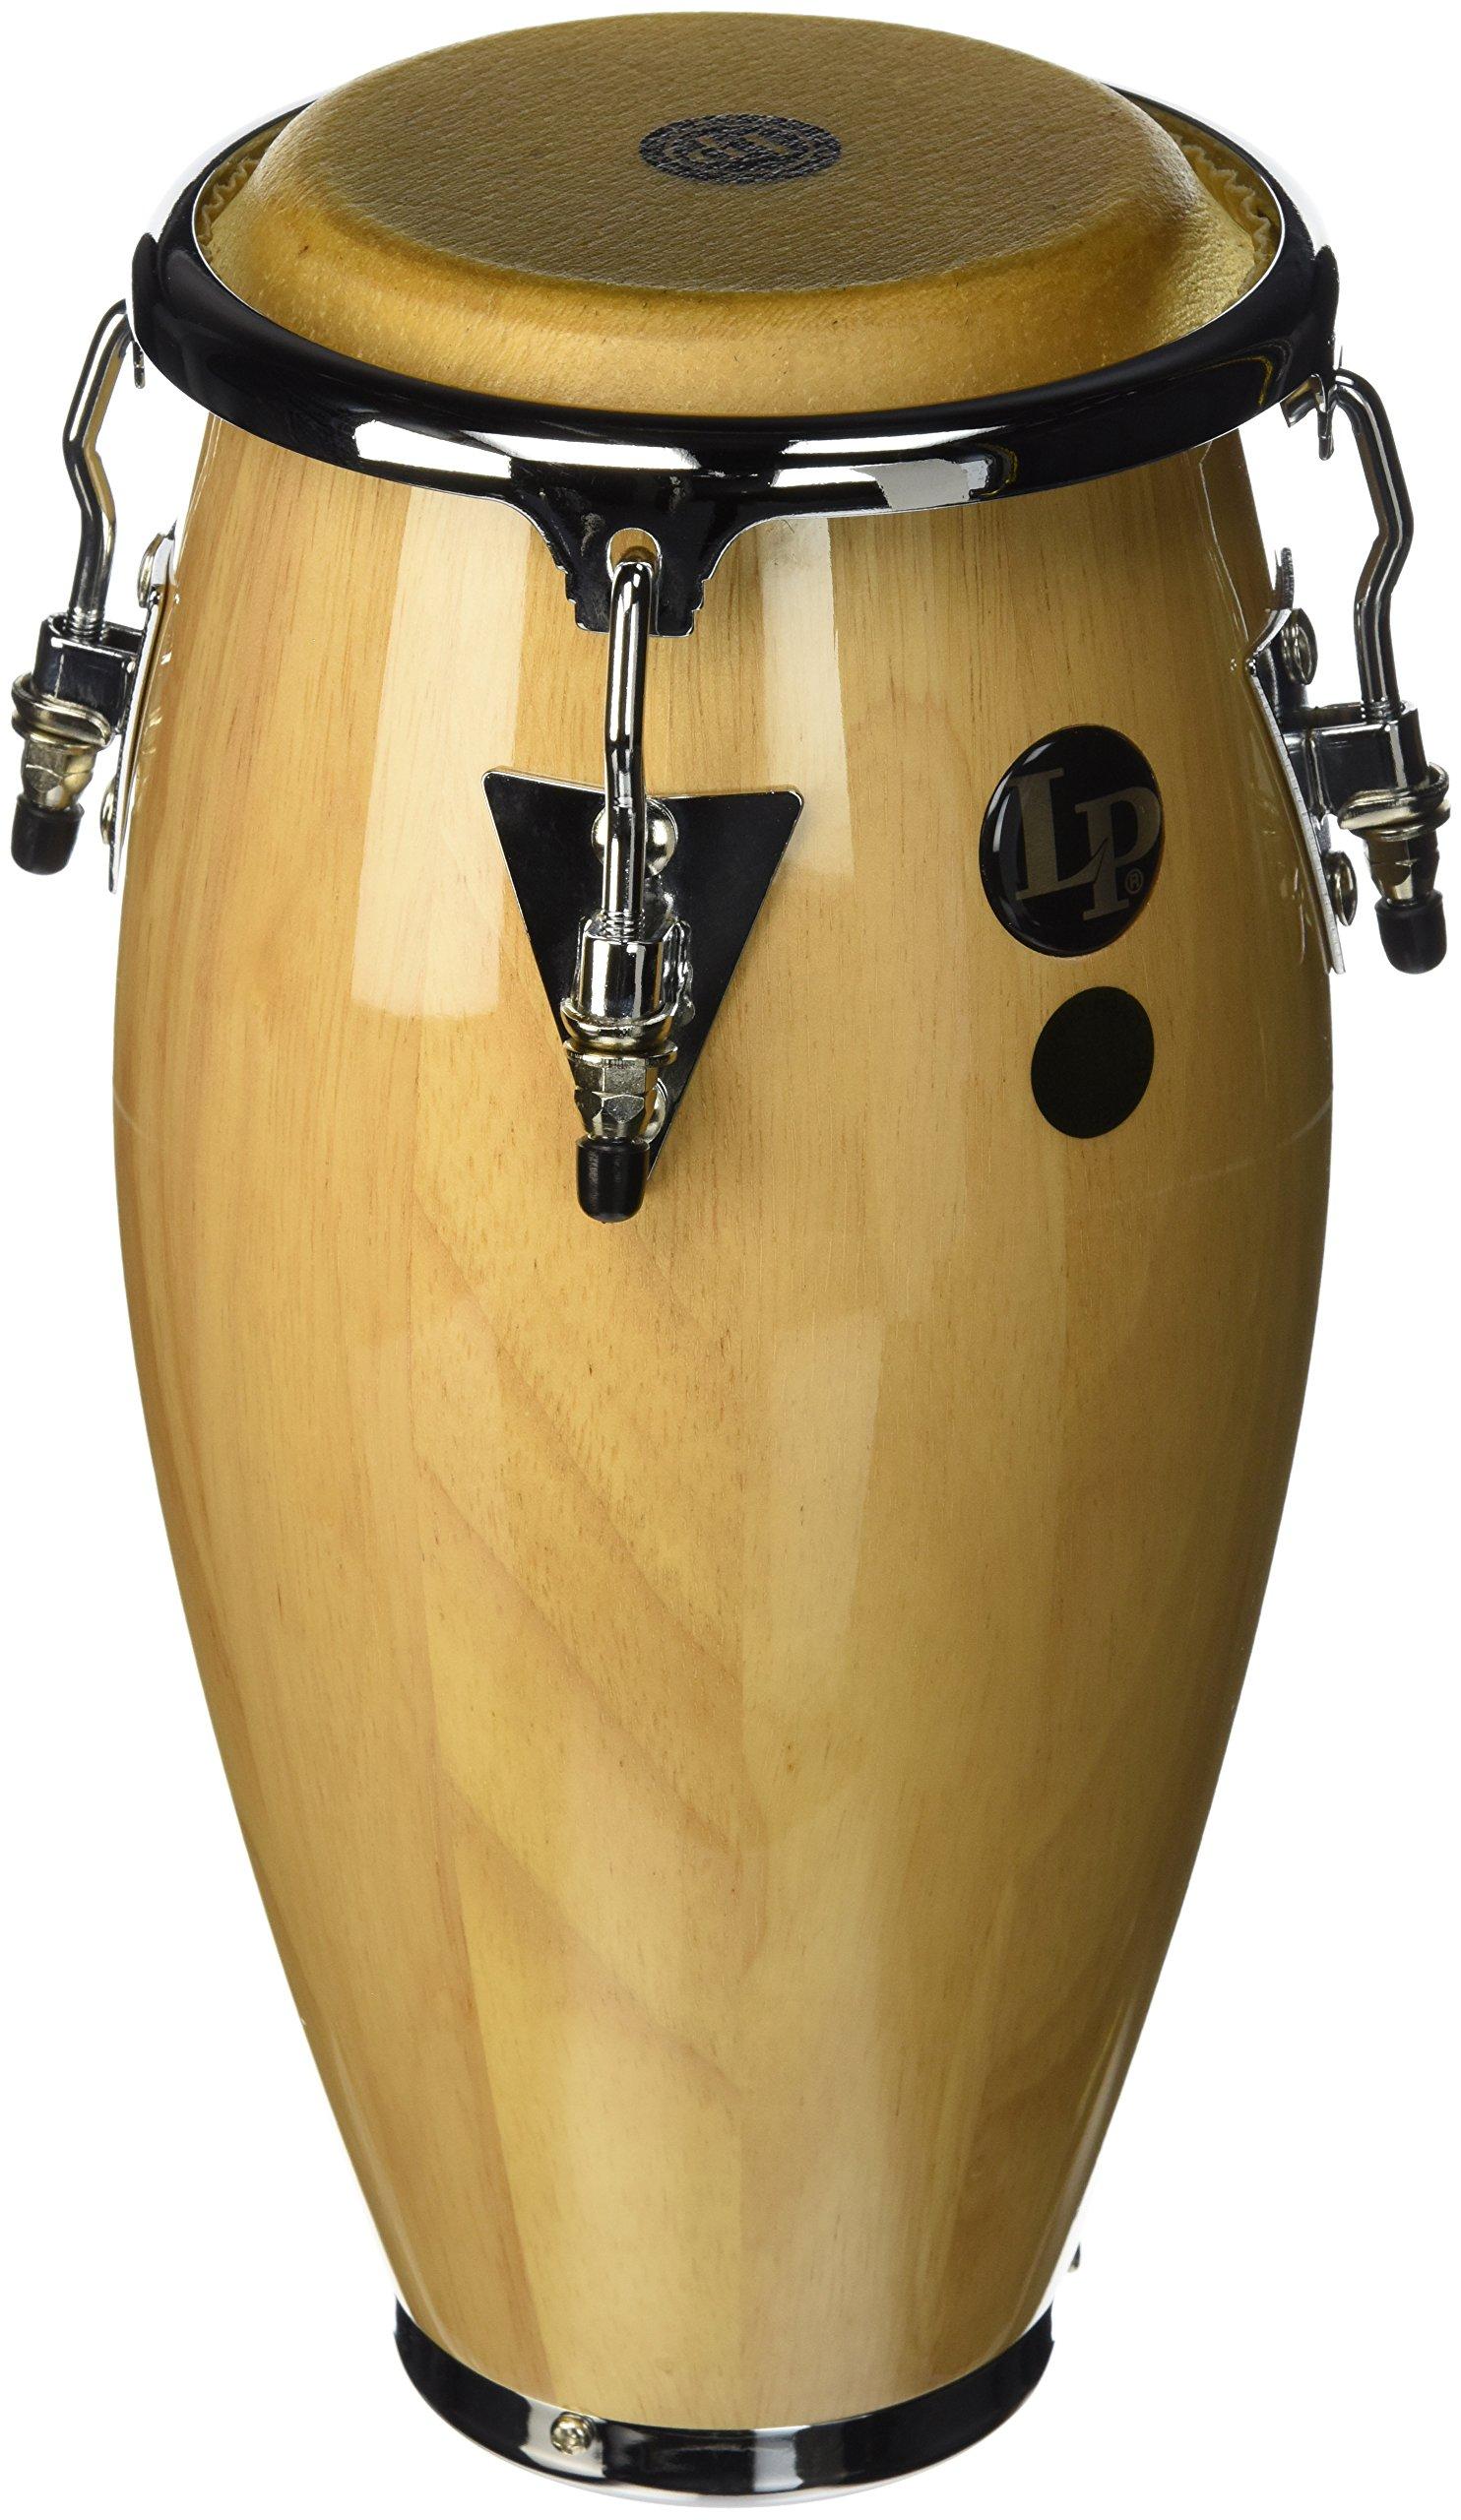 Lp Lpm198 Mini Tunable Wood Conga Natural by Latin Percussion